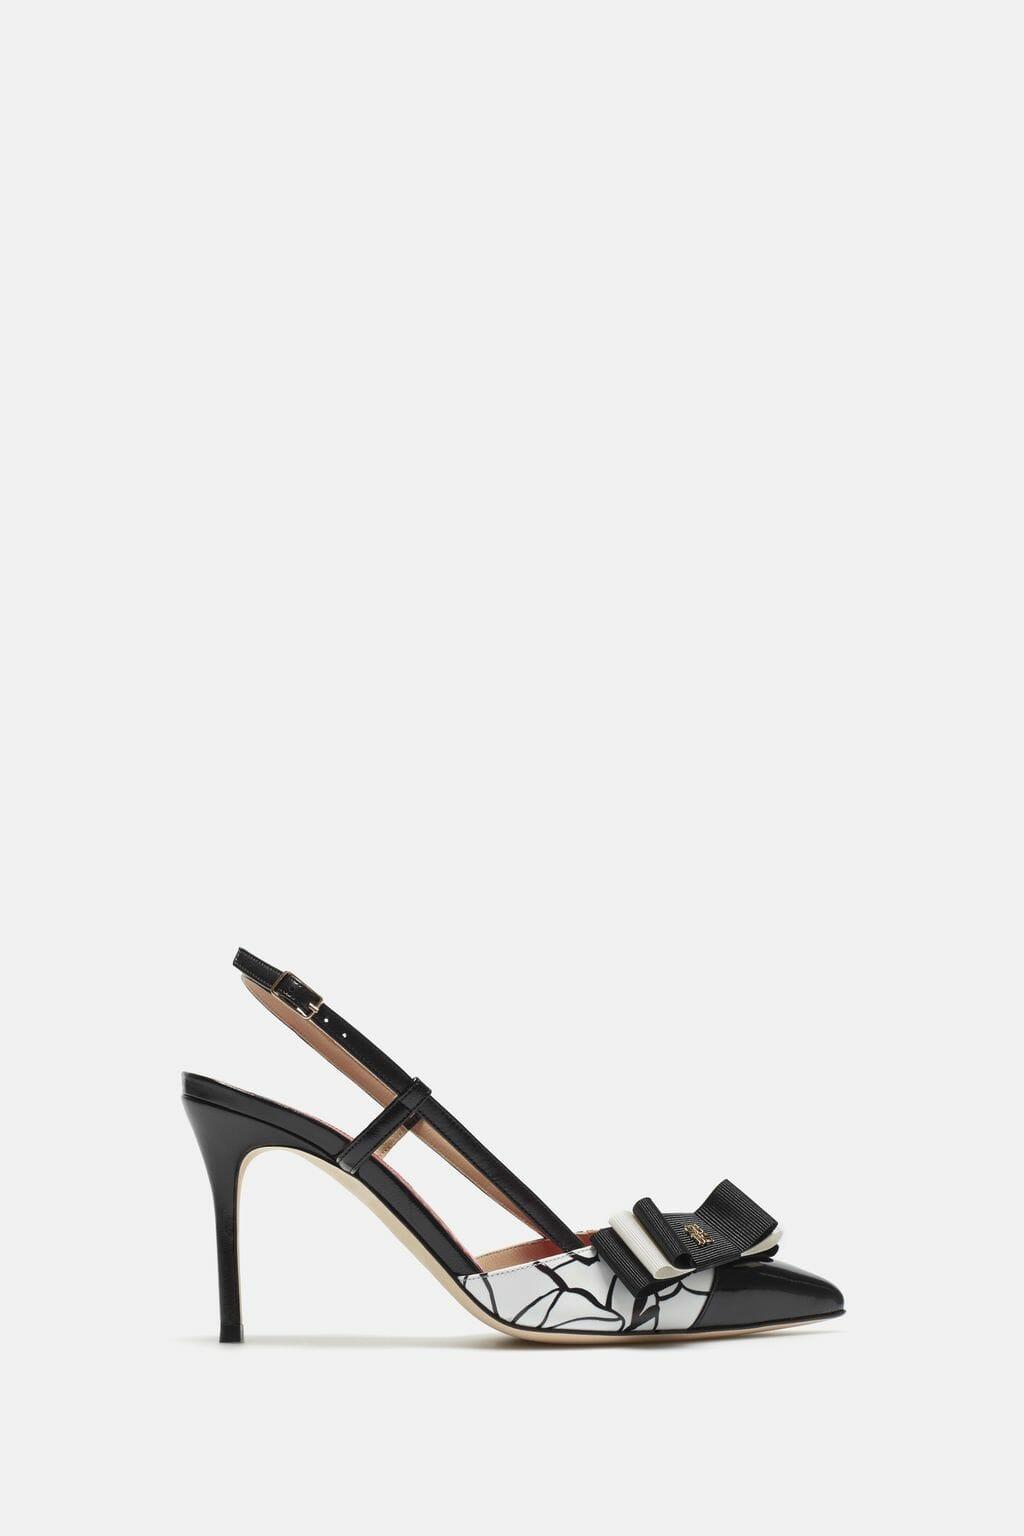 CH-Carolina-herrera-shoes-collection-Spring-Summer-2018-shoe-54